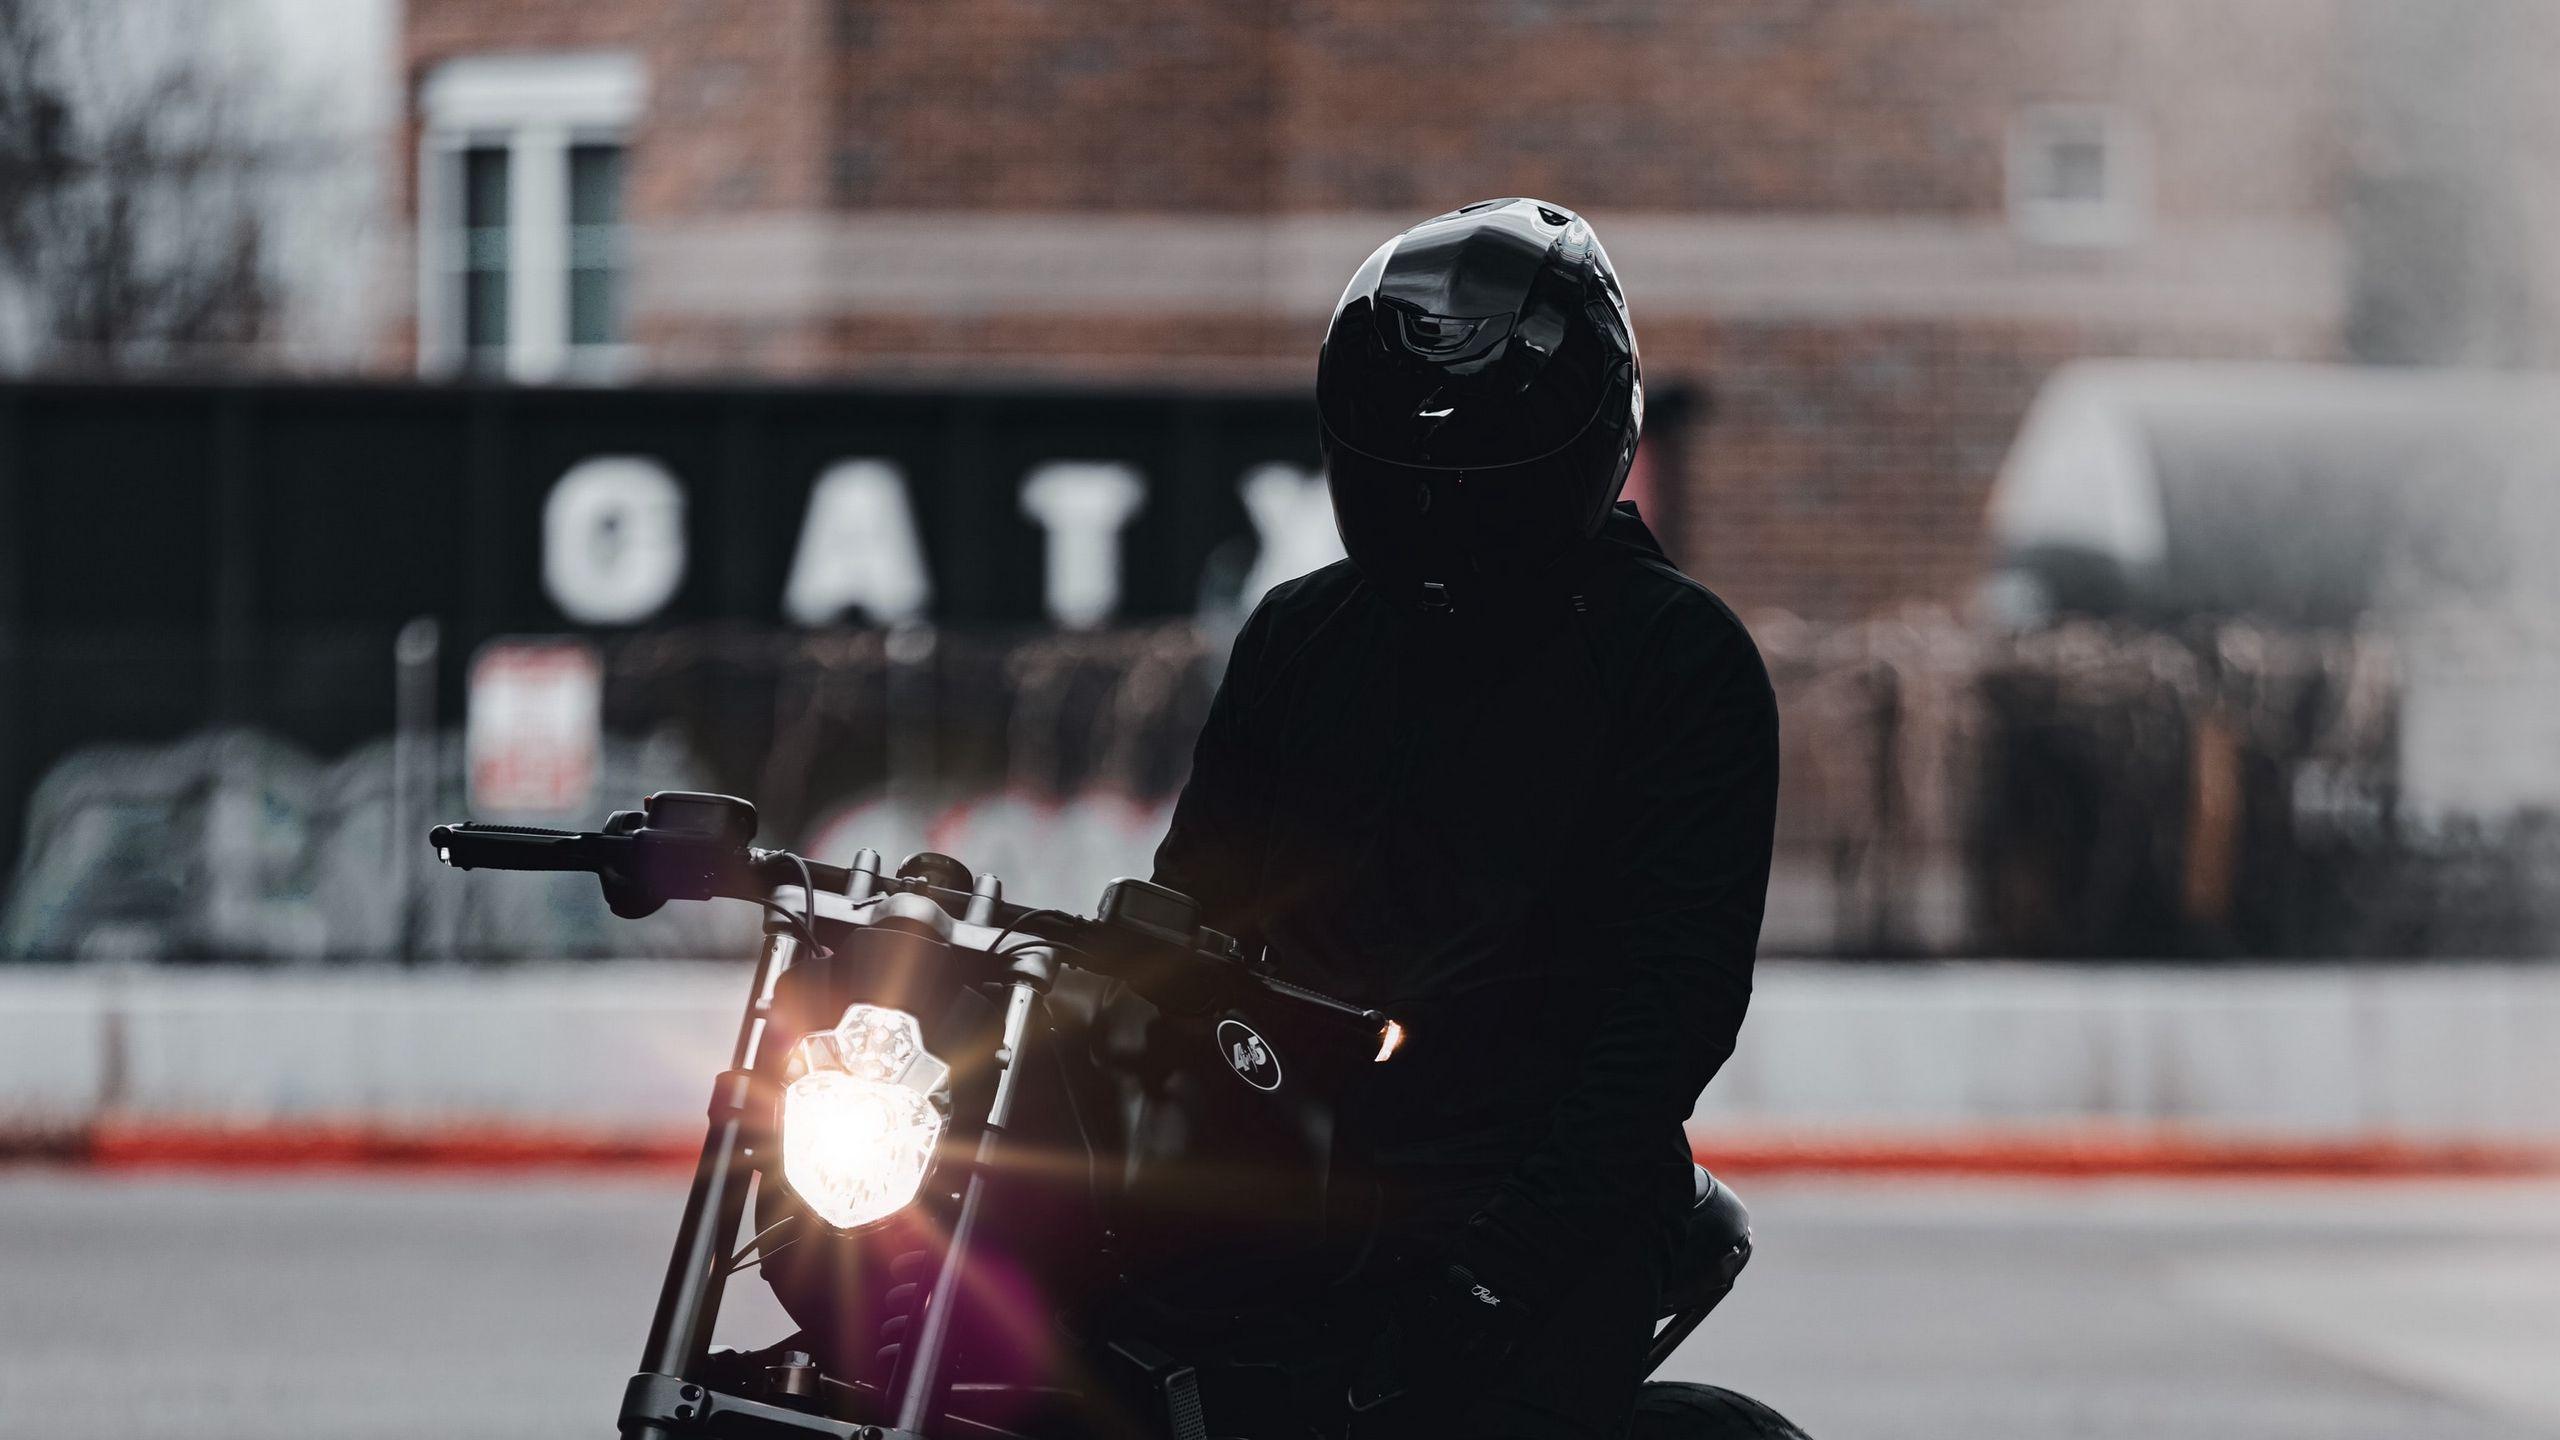 2560x1440 Обои мотоцикл, байк, мотоциклист, черный, свет, дорога